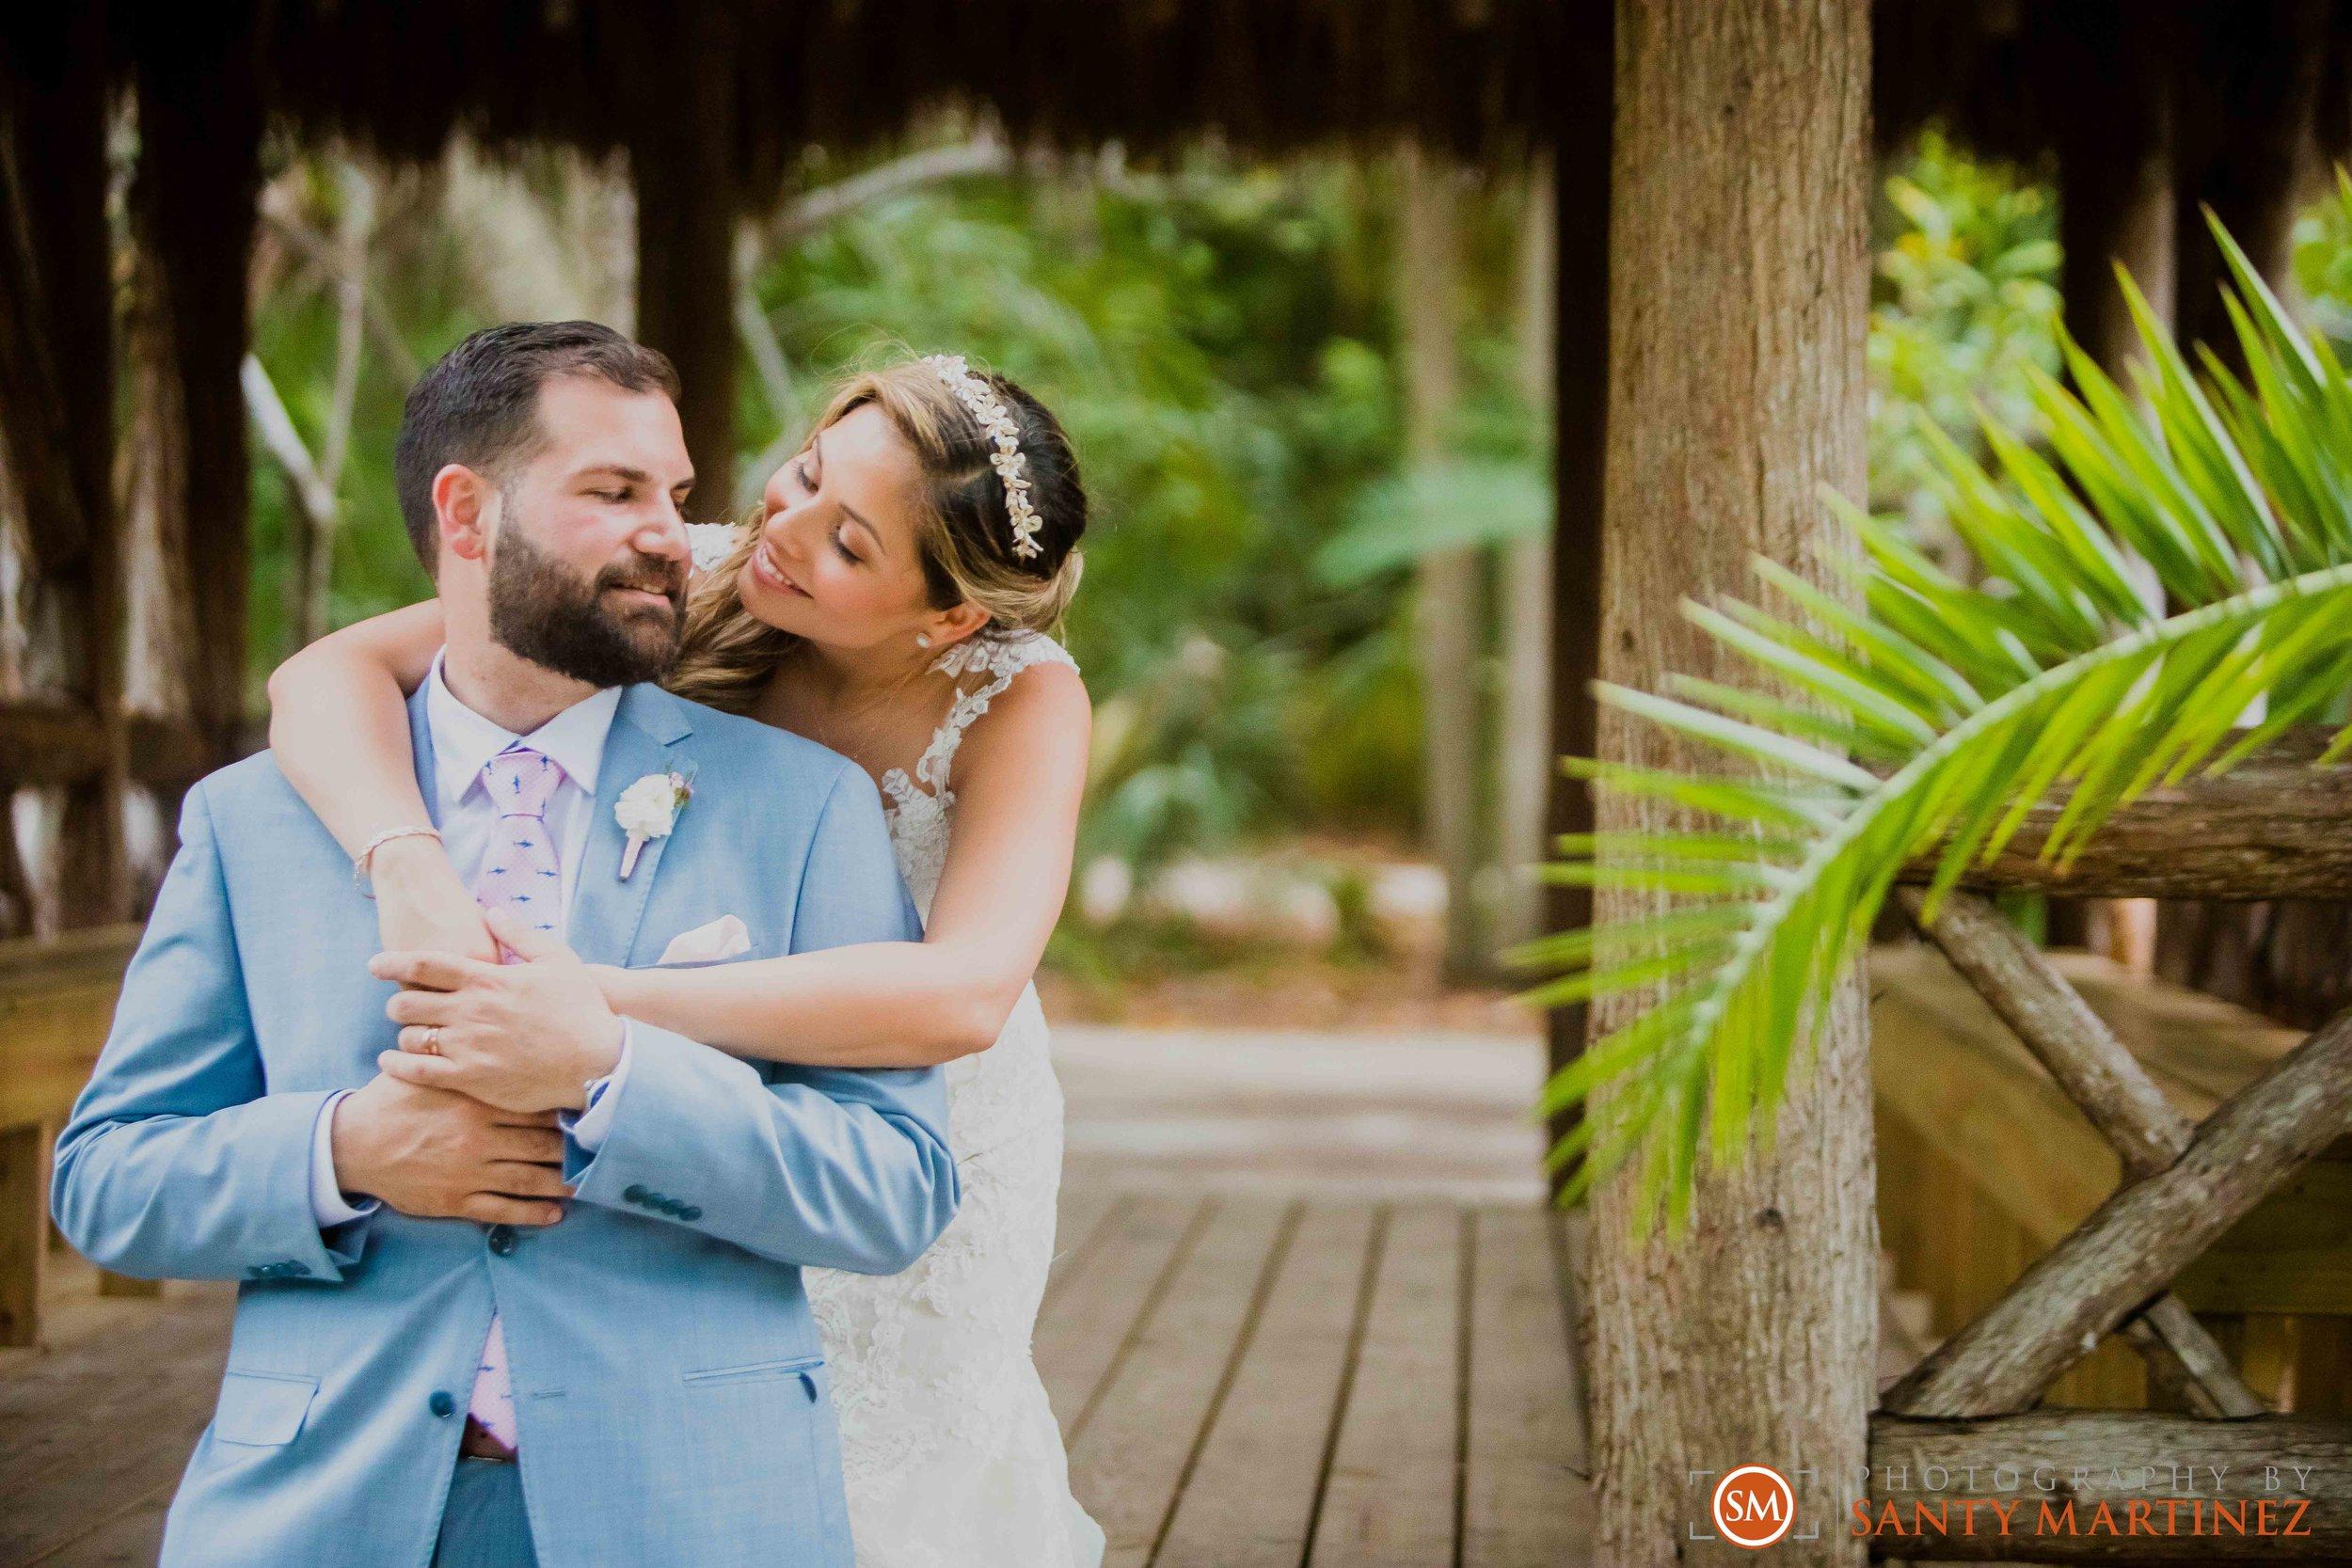 Wedding Bonnet House - Santy Martinez Photography-59.jpg